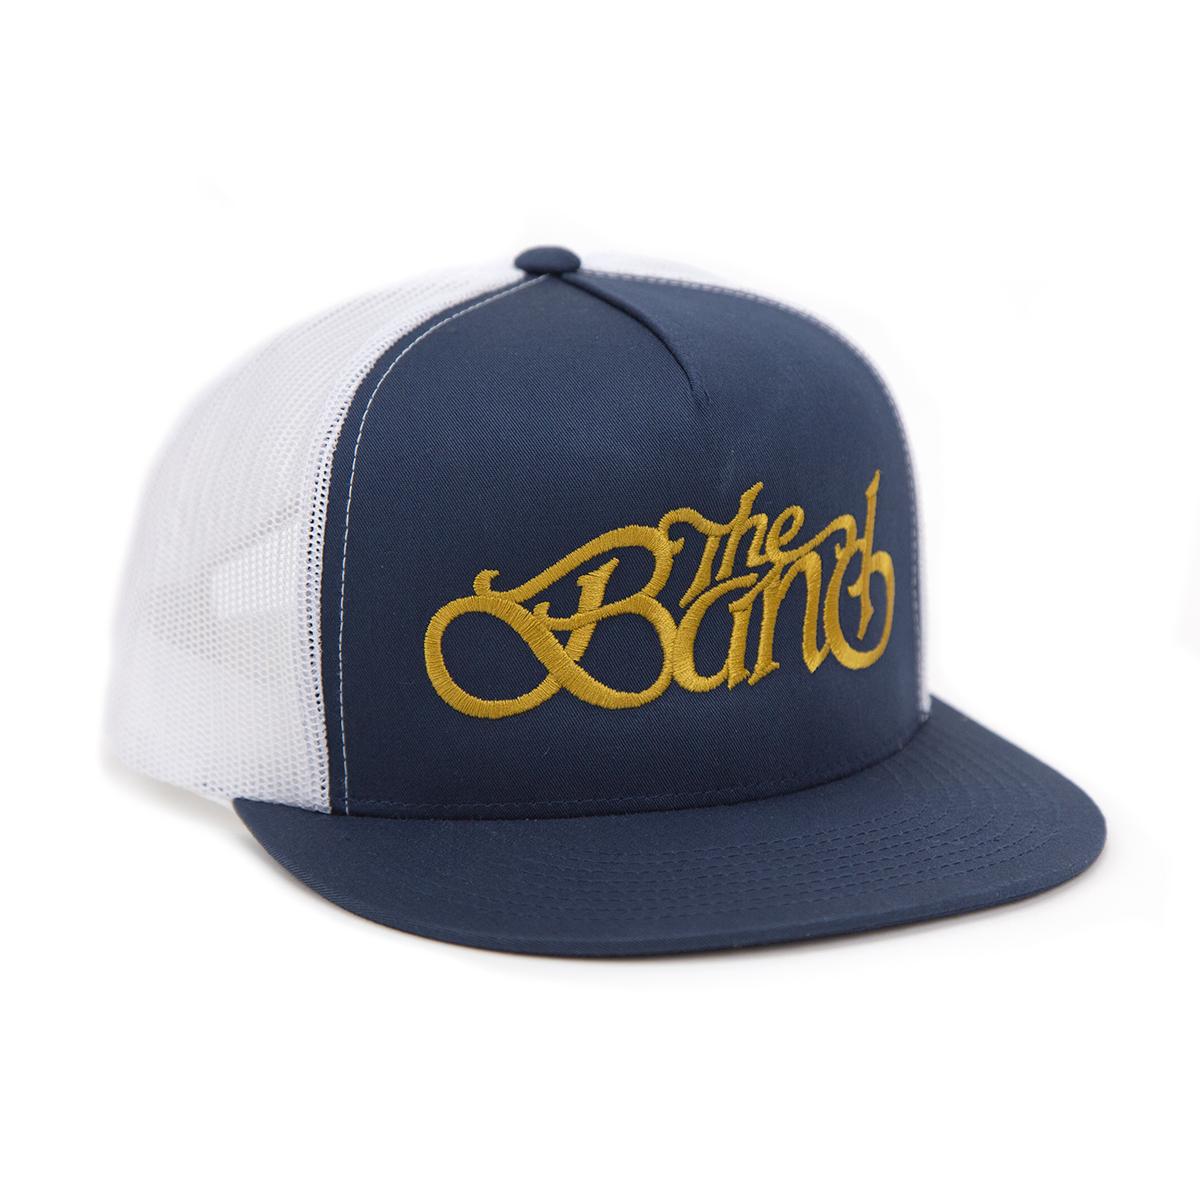 Embroidered Logo Snapback Hat